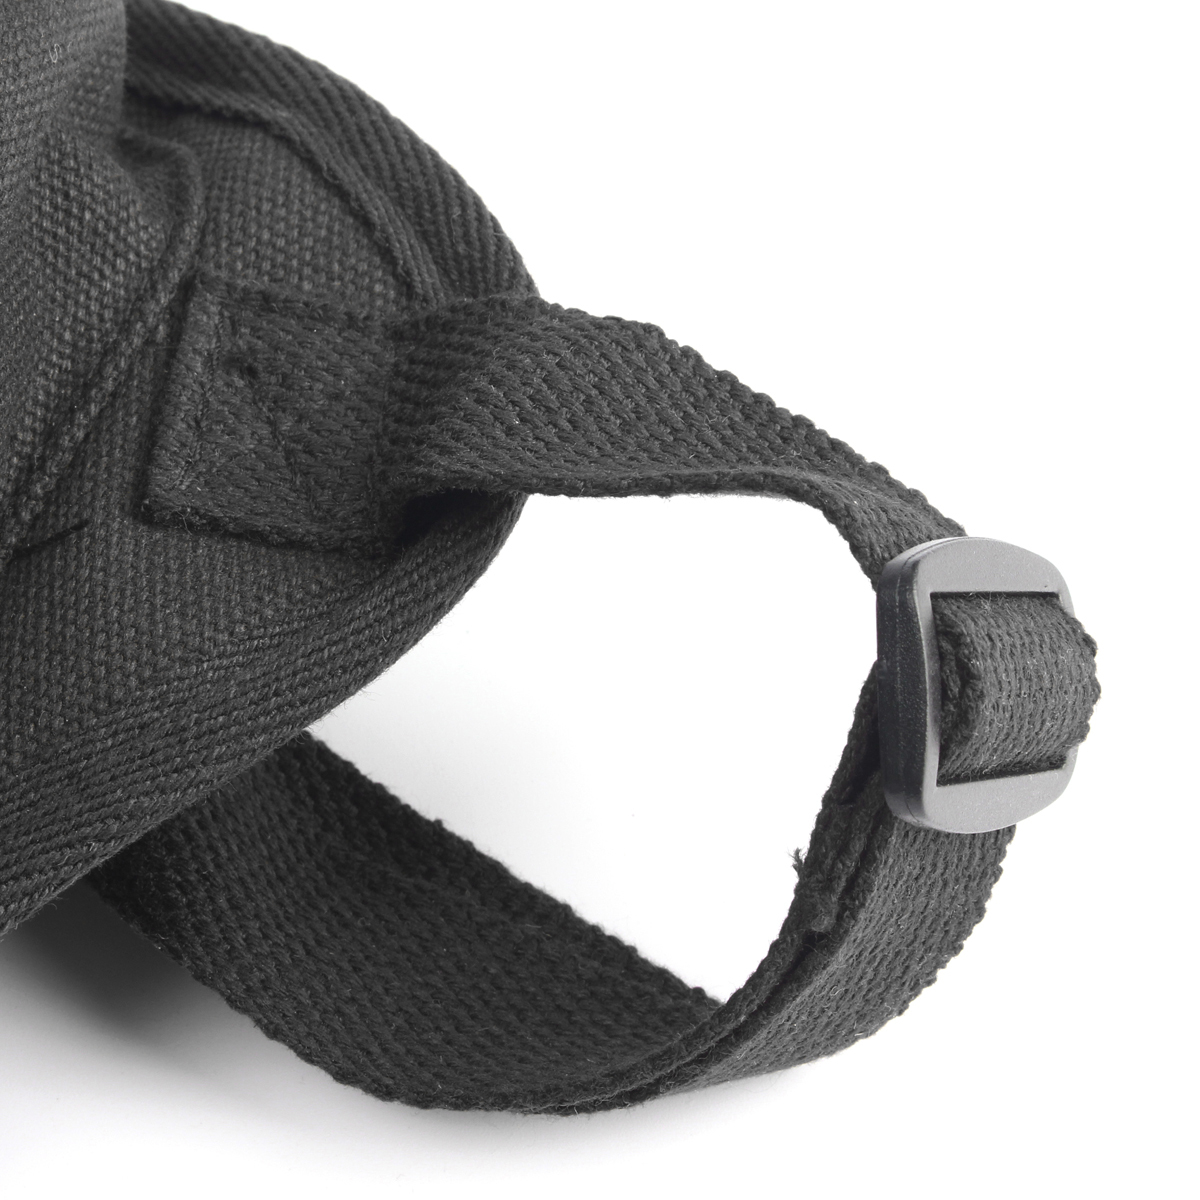 Kolam kanvas militer taktis paha kaki Drop tas kantong ikat pinggang hitam International .